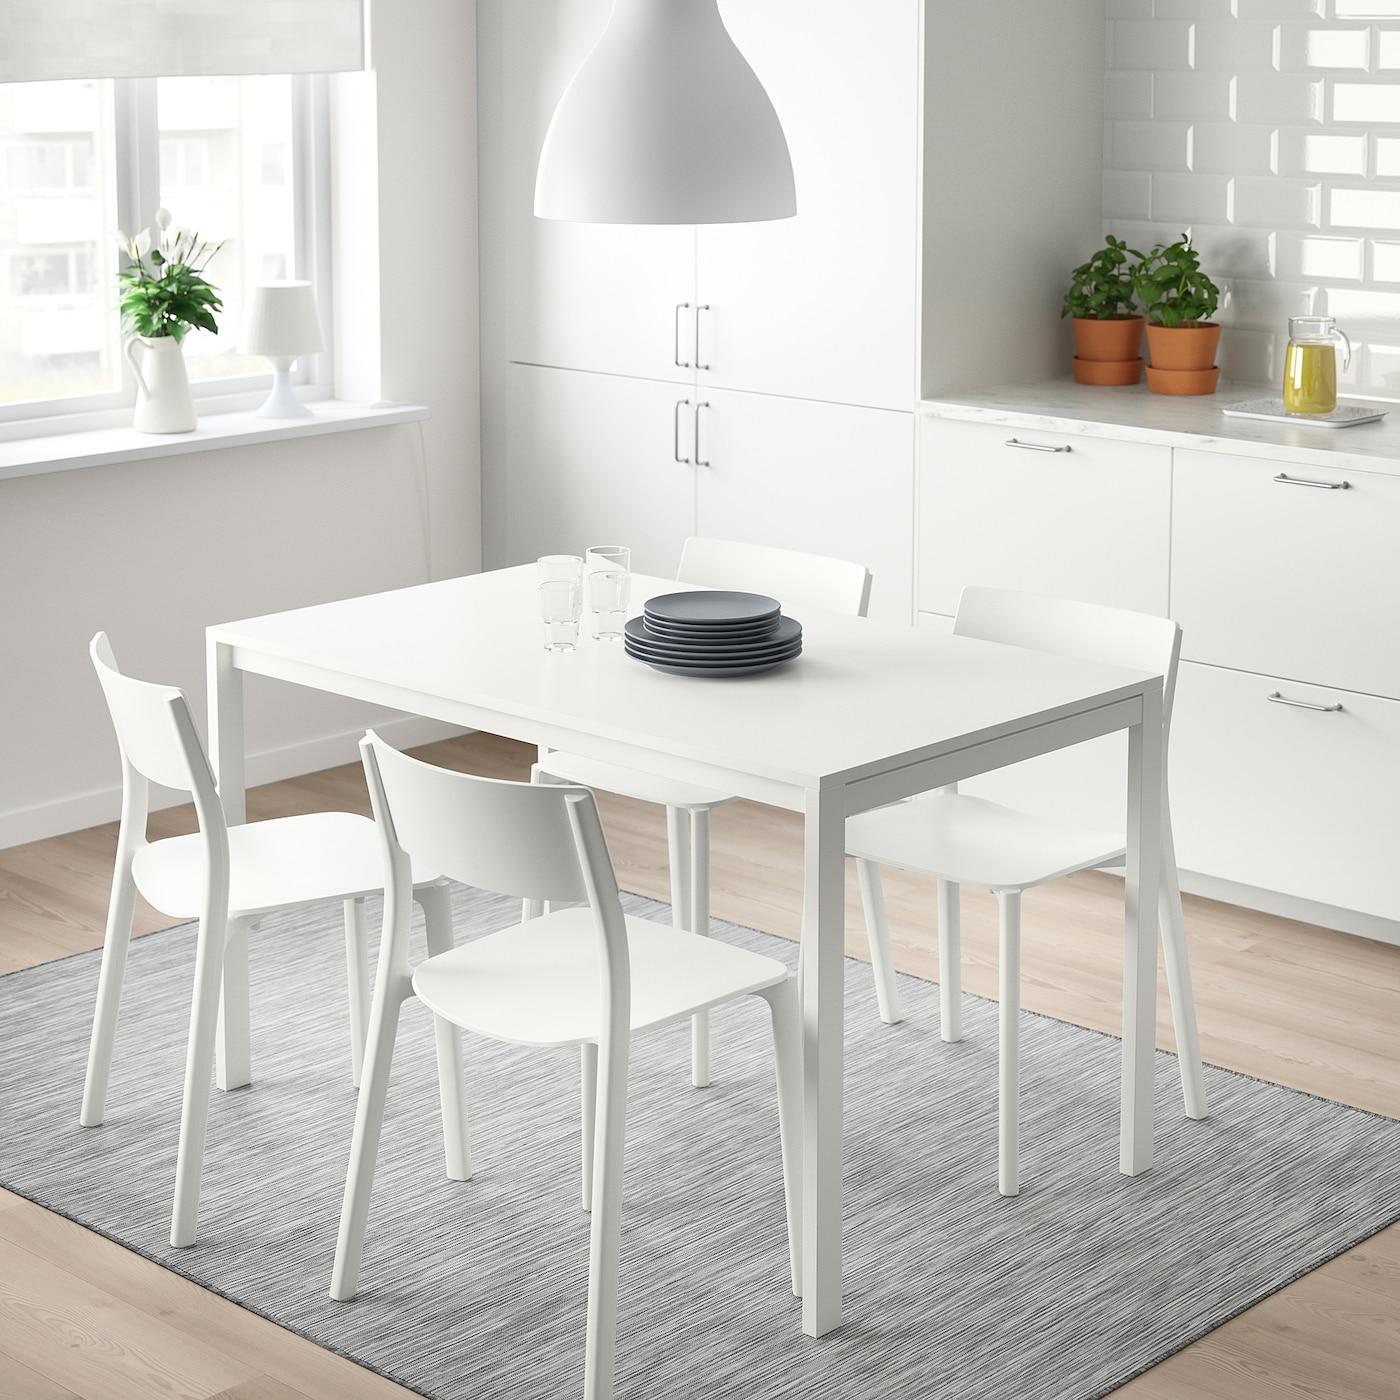 Melltorp Table White Ikea